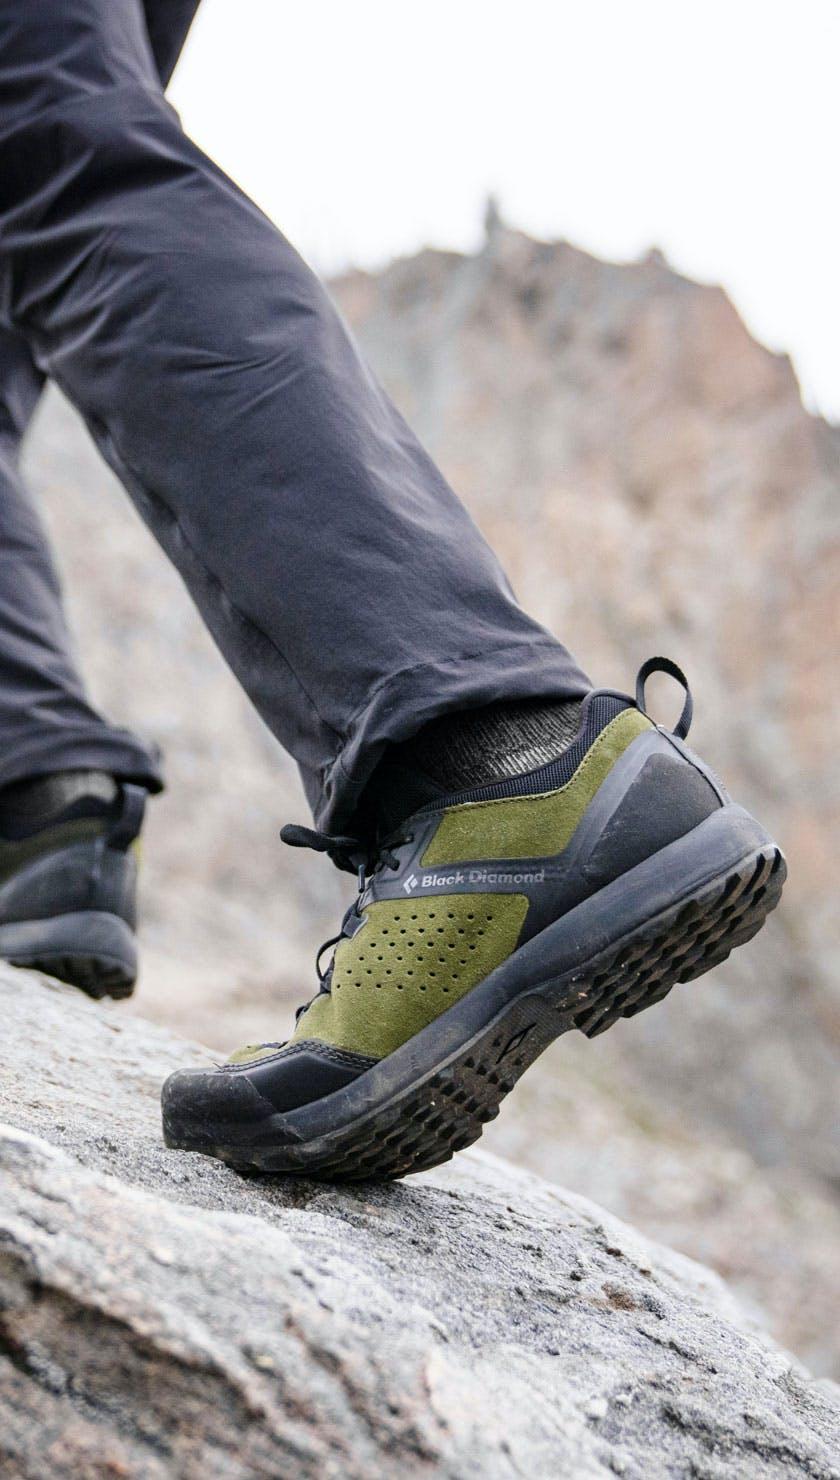 A hiker wearing the Black Diamond Mission XP Approach Shoe